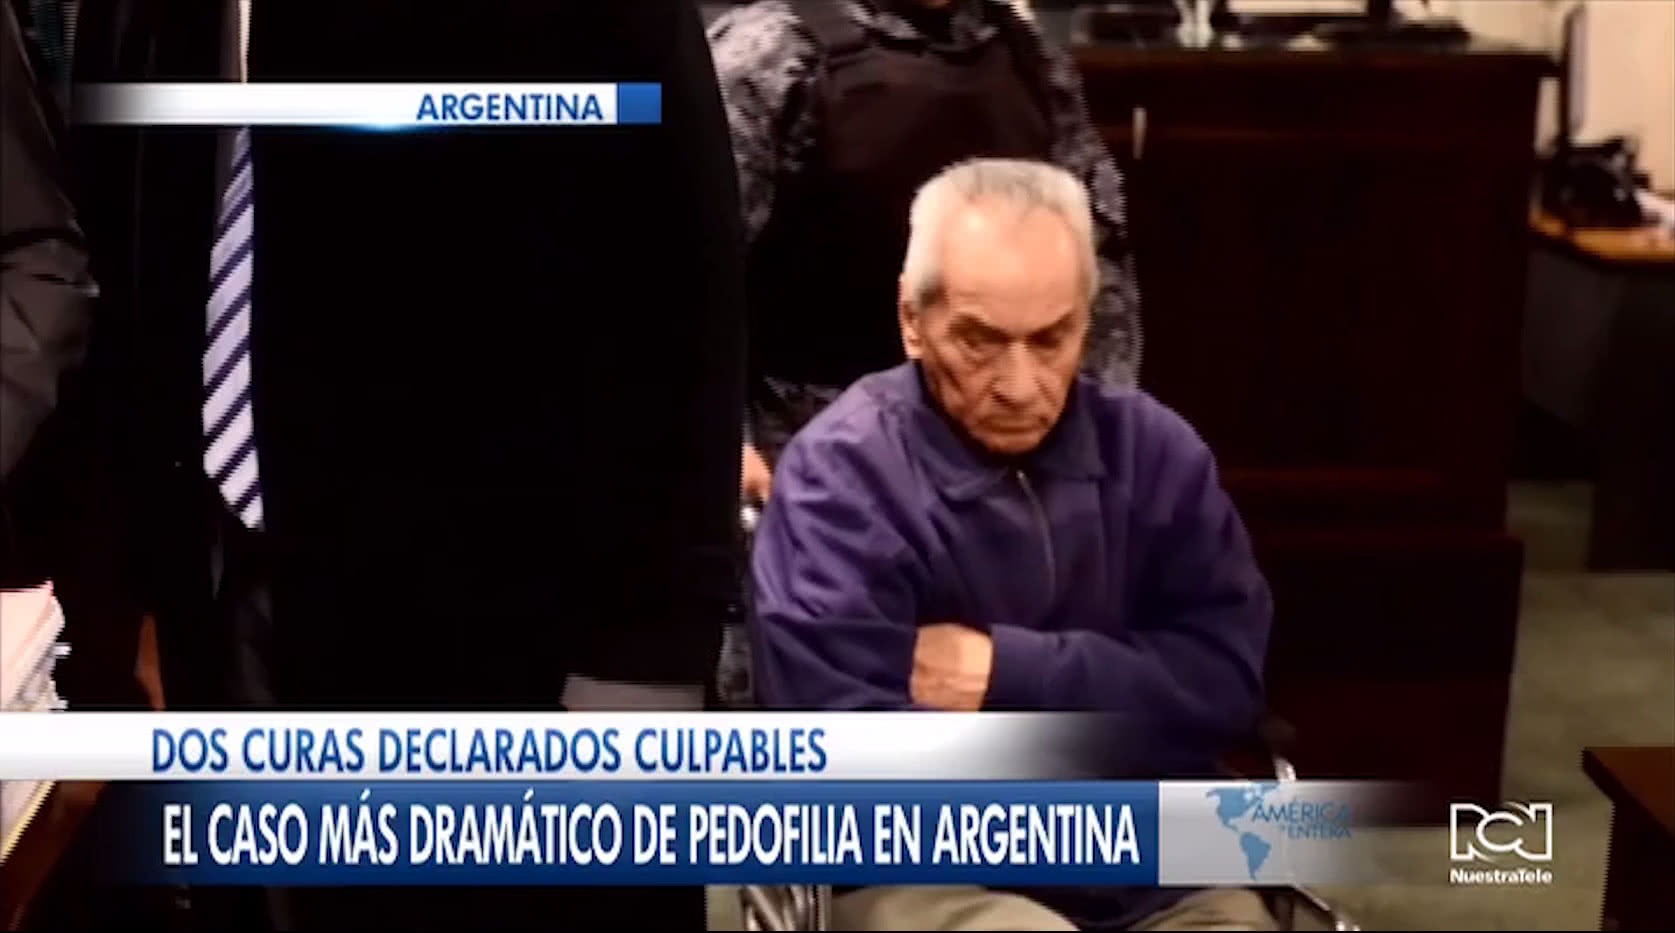 Condenan a sacerdotes pederastas en Argentina